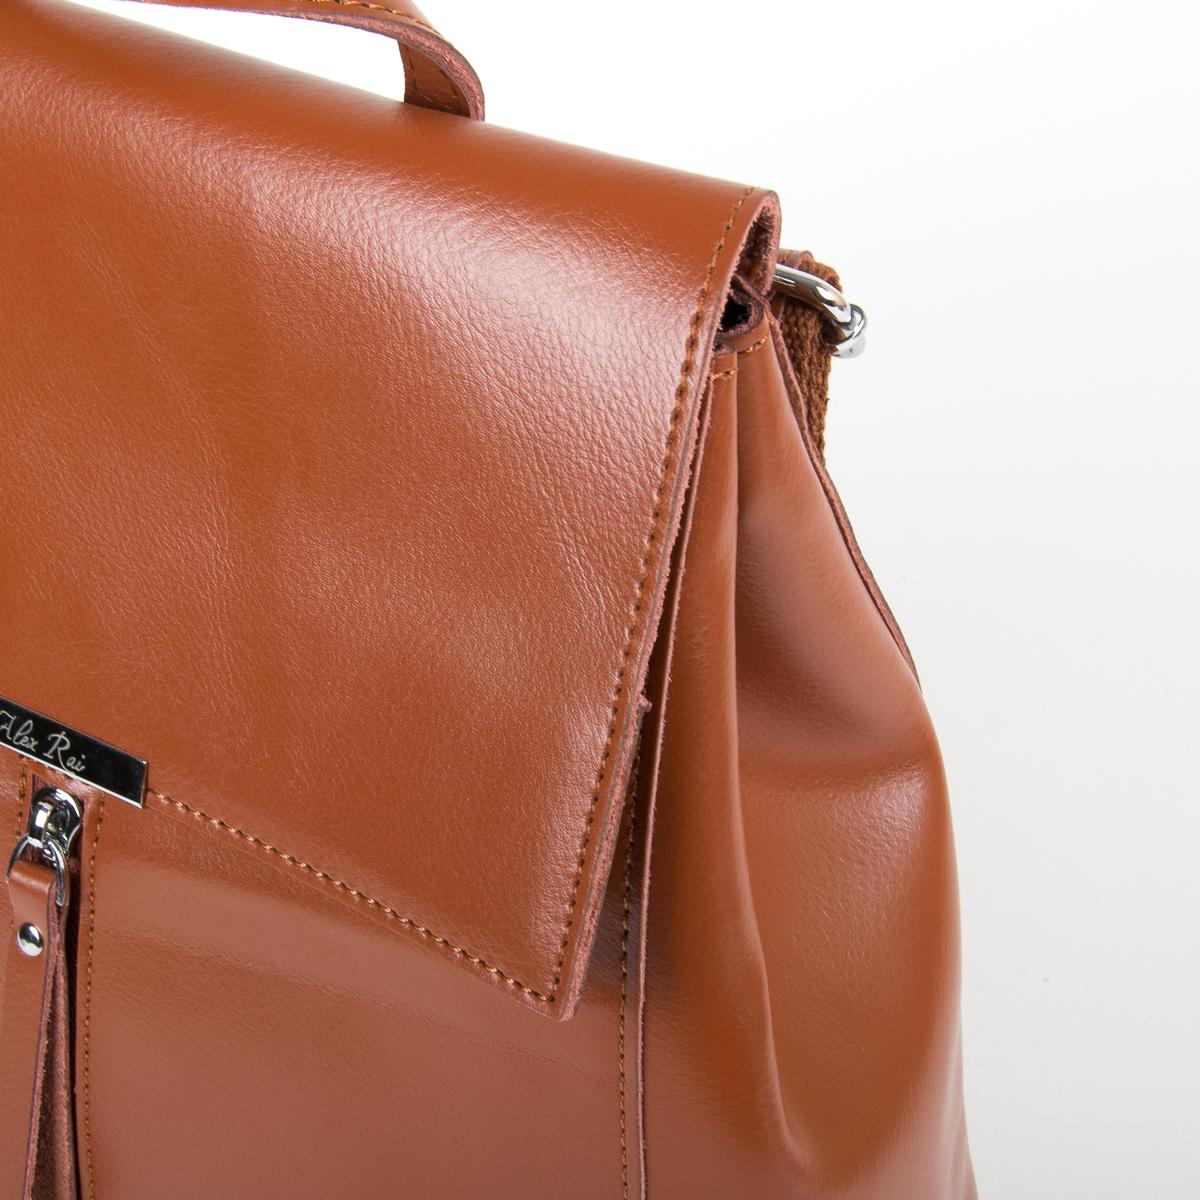 Сумка Женская Рюкзак кожа ALEX RAI 9-01 373 khaki - фото 3